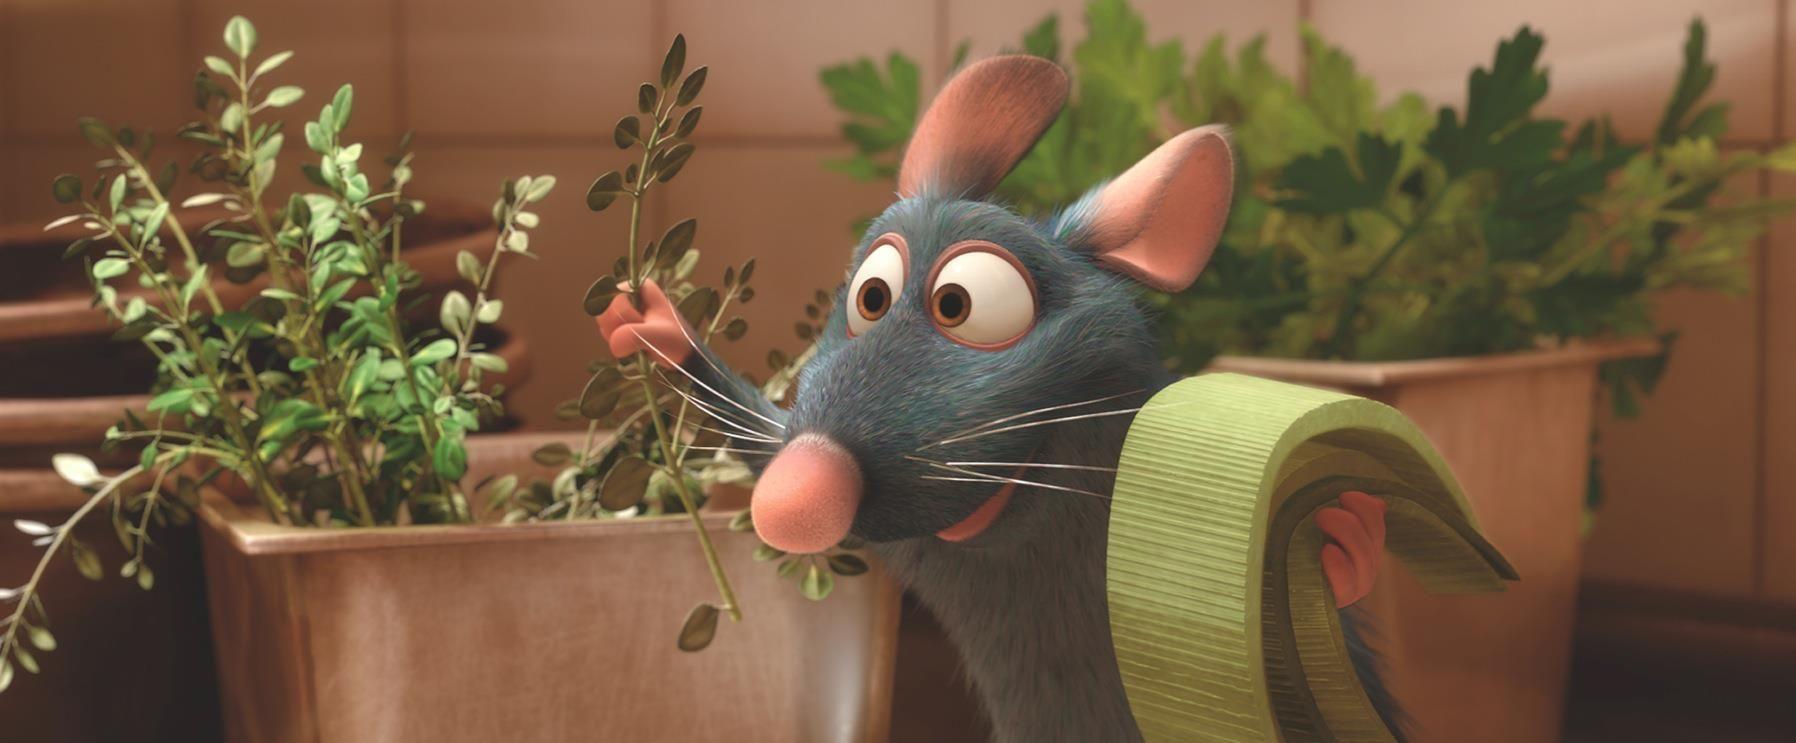 Pin by cherrys world on childhood memories ratatouille